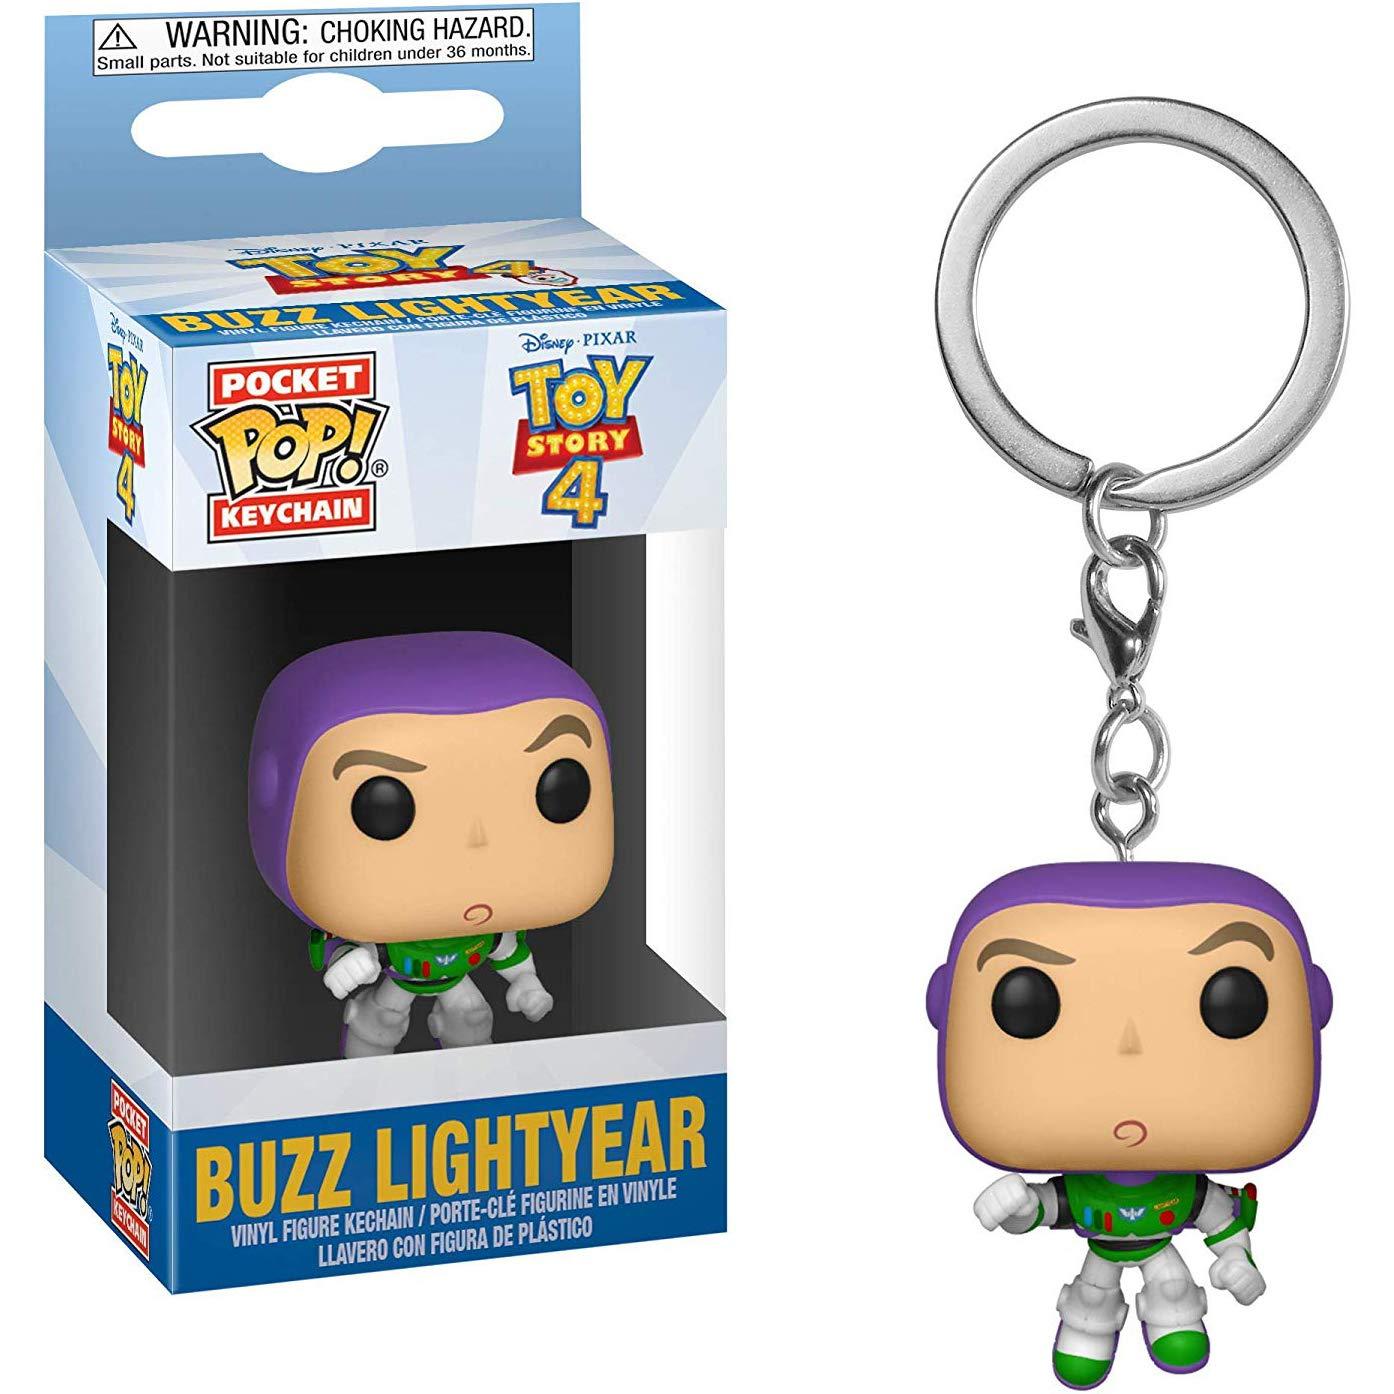 Amazon.com: Buzz Lightyear: Funko Pocket POP! Mini-Figural ...